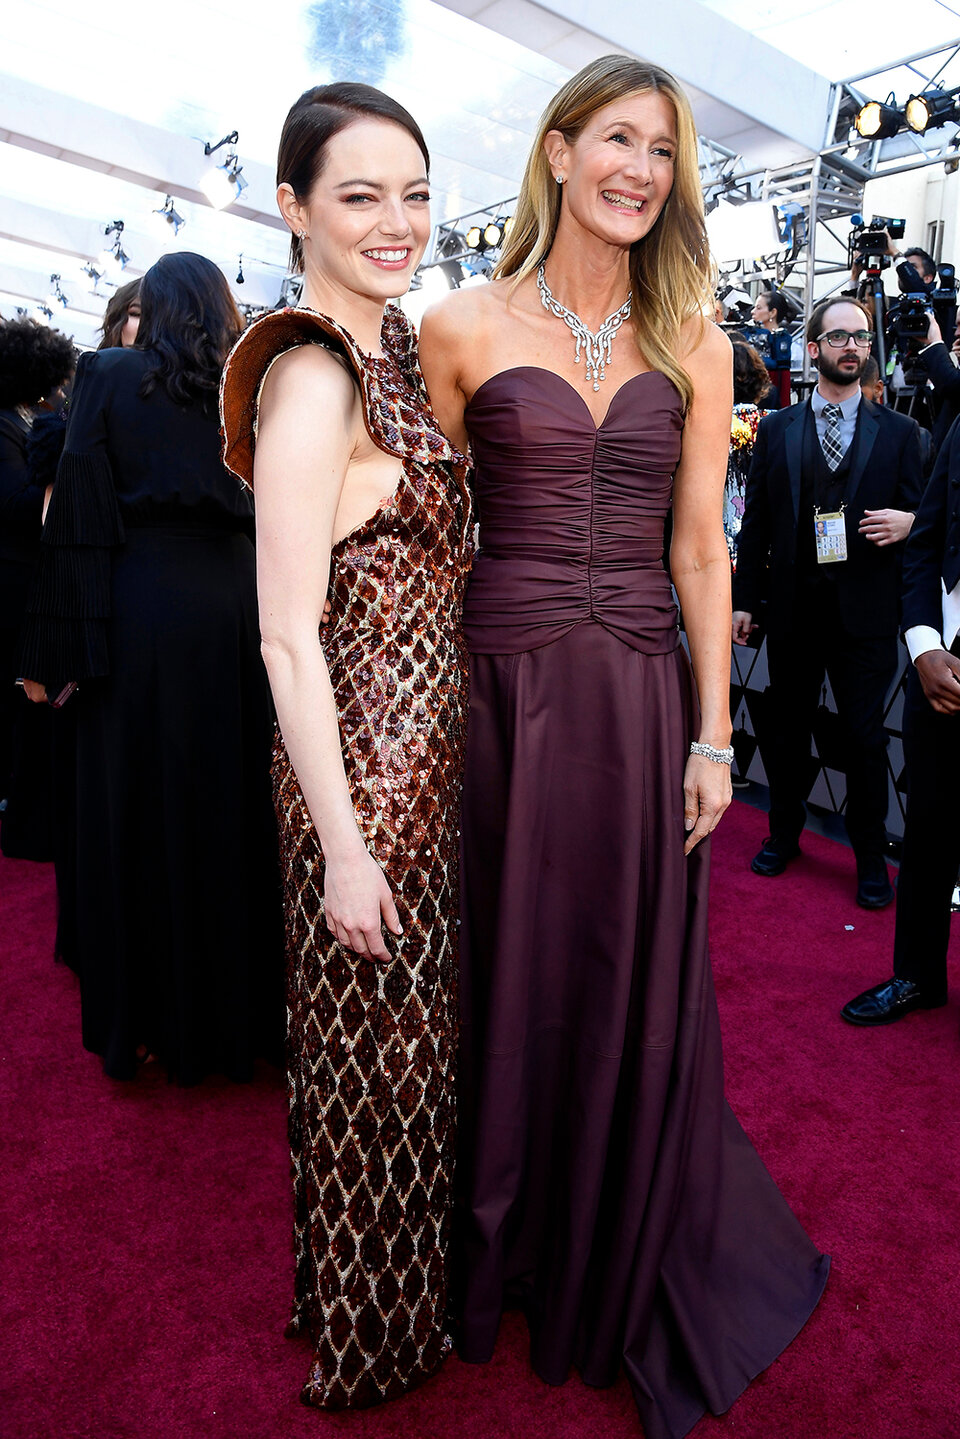 Эмма Стоун и Лора Дерн / Фото: Getty Images